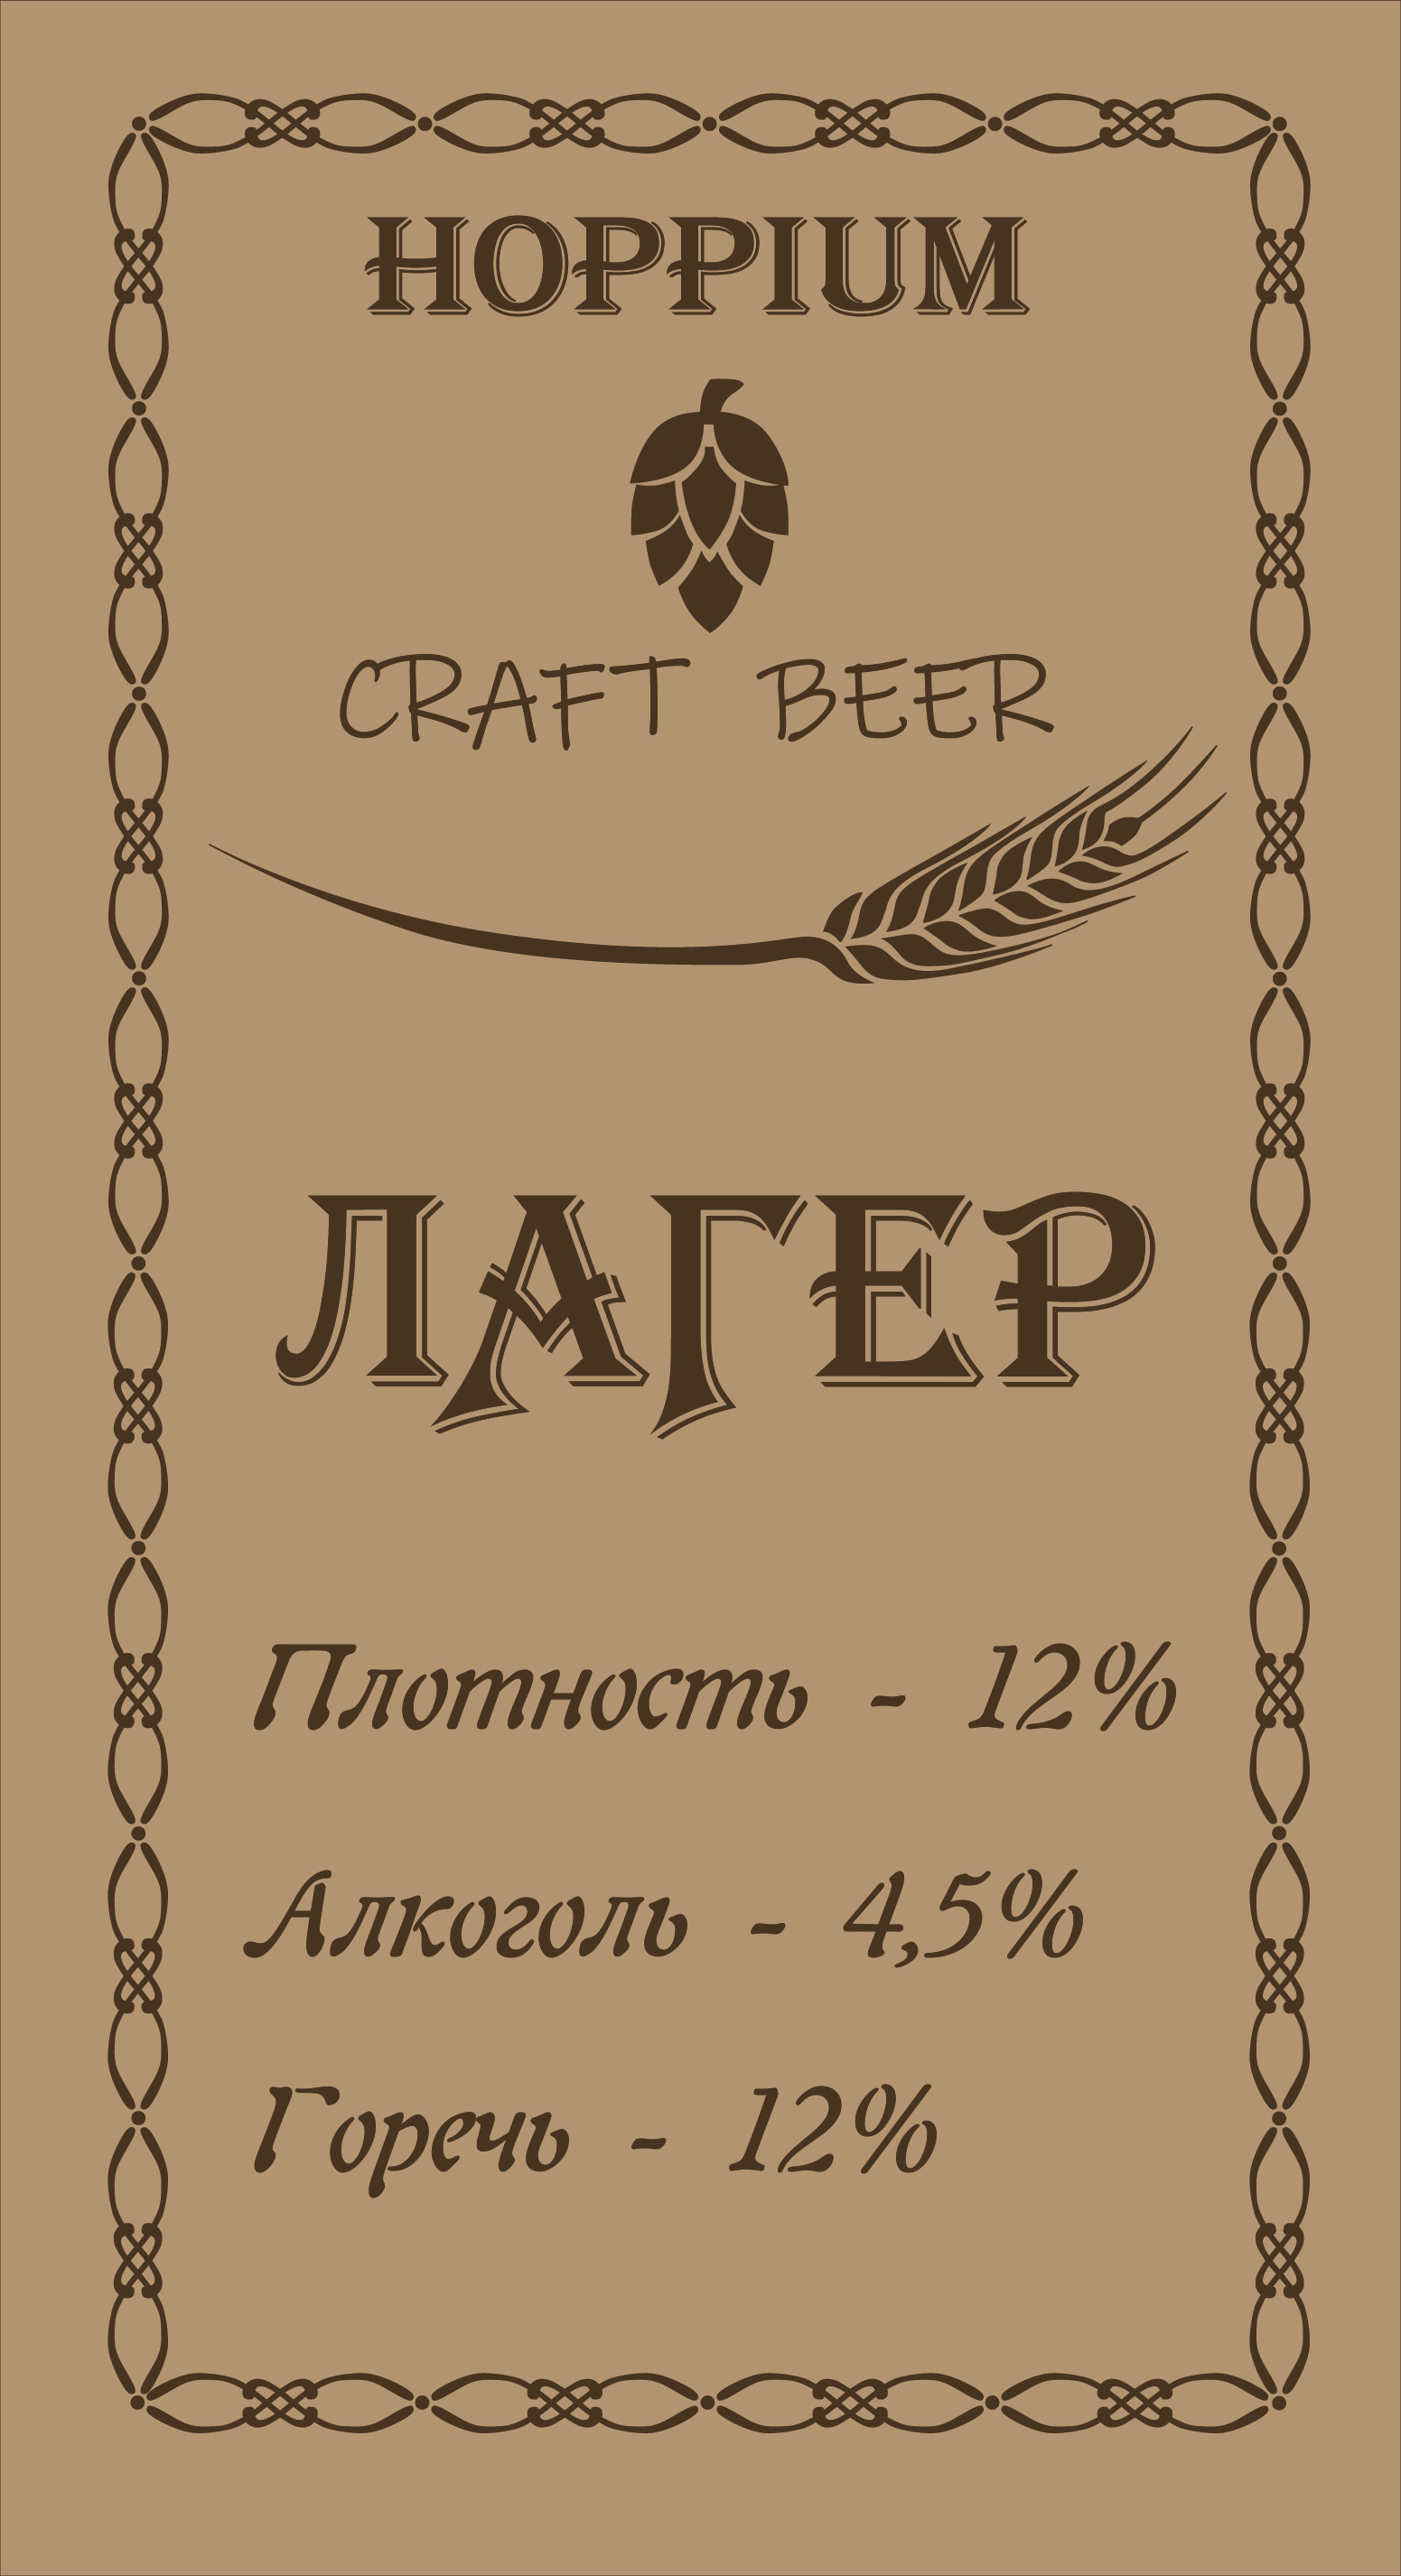 Логотип + Ценники для подмосковной крафтовой пивоварни фото f_3645dc02a71a3abb.jpg